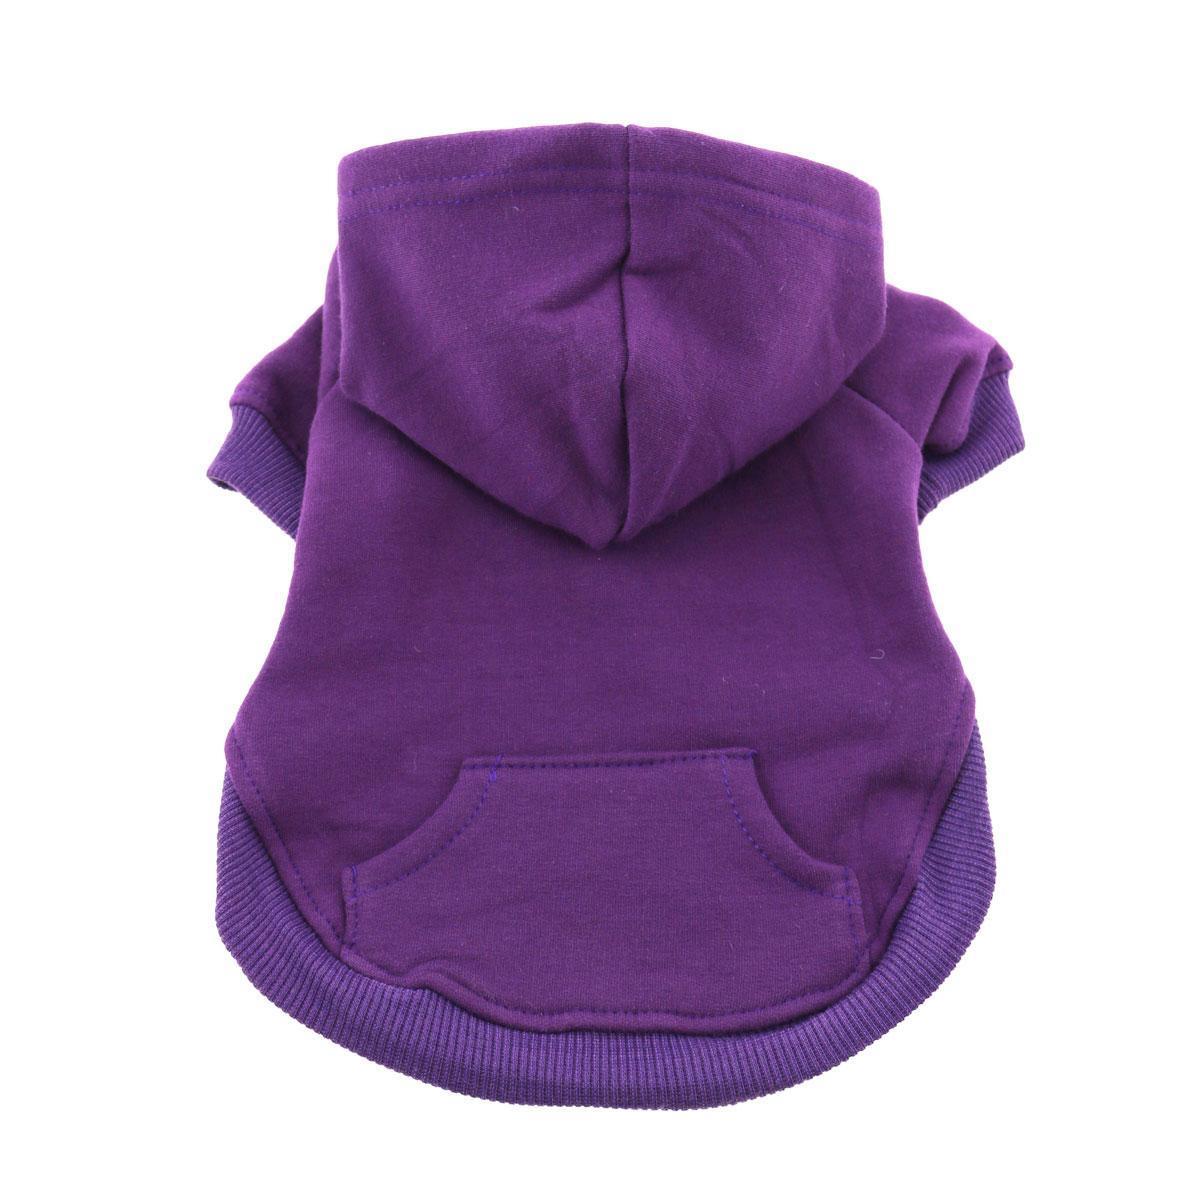 Barking Basics Dog Hoodie - Purple